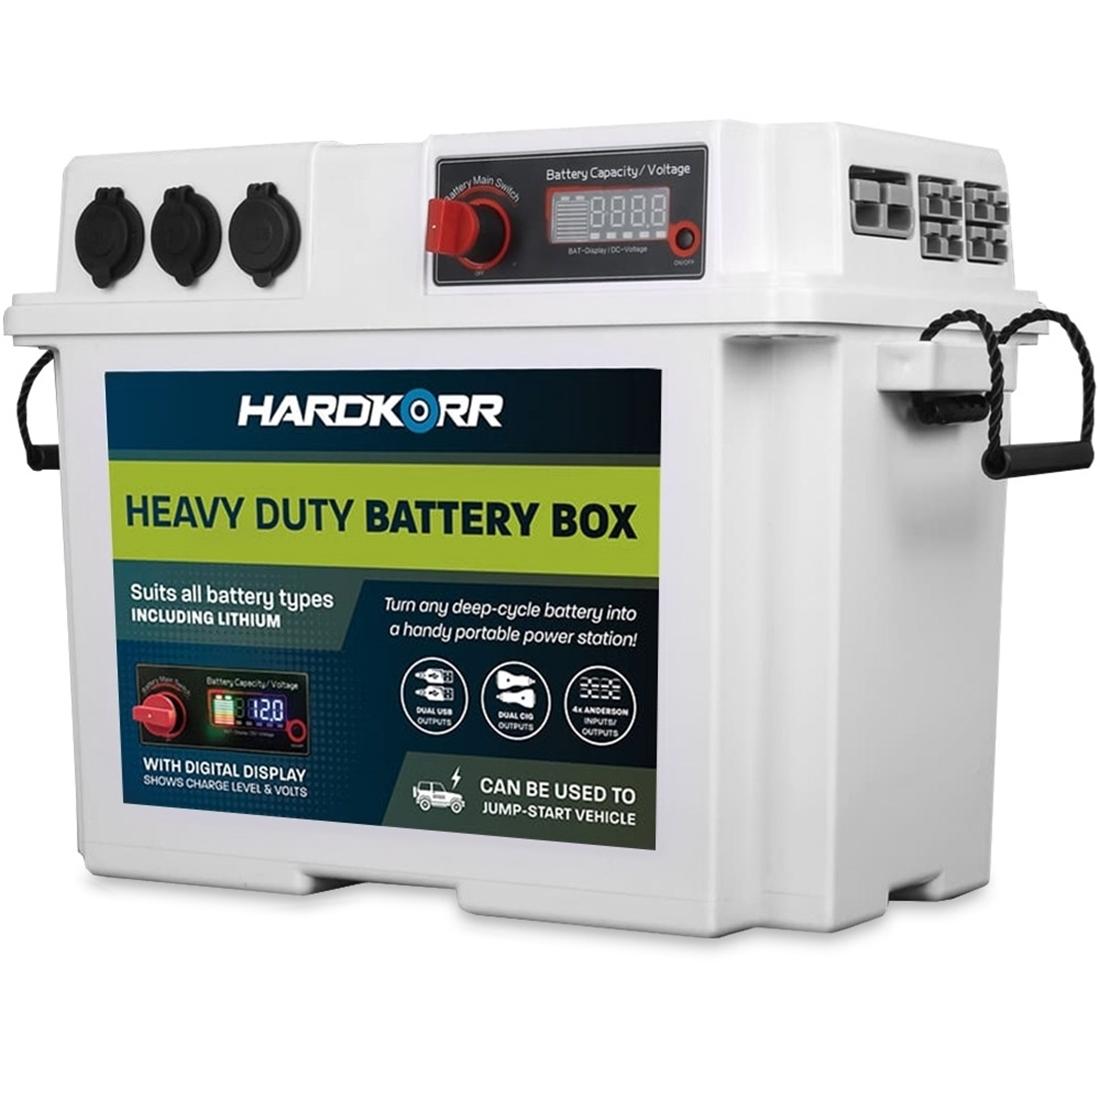 Hard Korr Heavy Duty Battery Box White